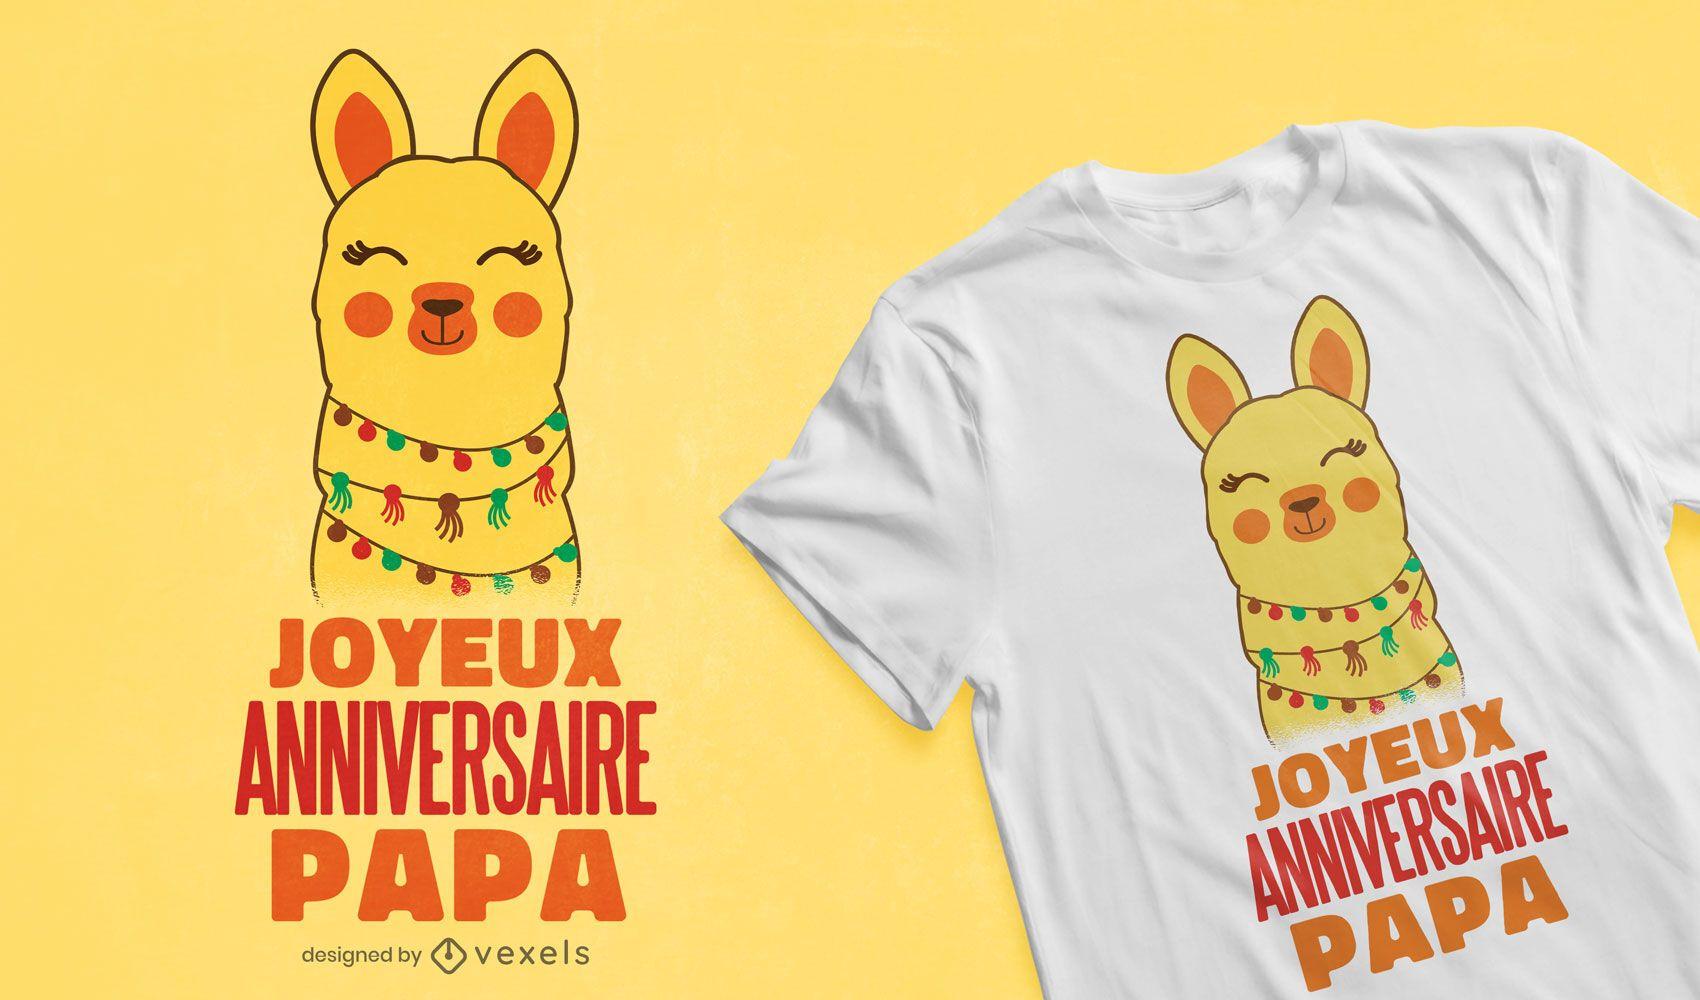 Alpaca birthday french t-shirt design